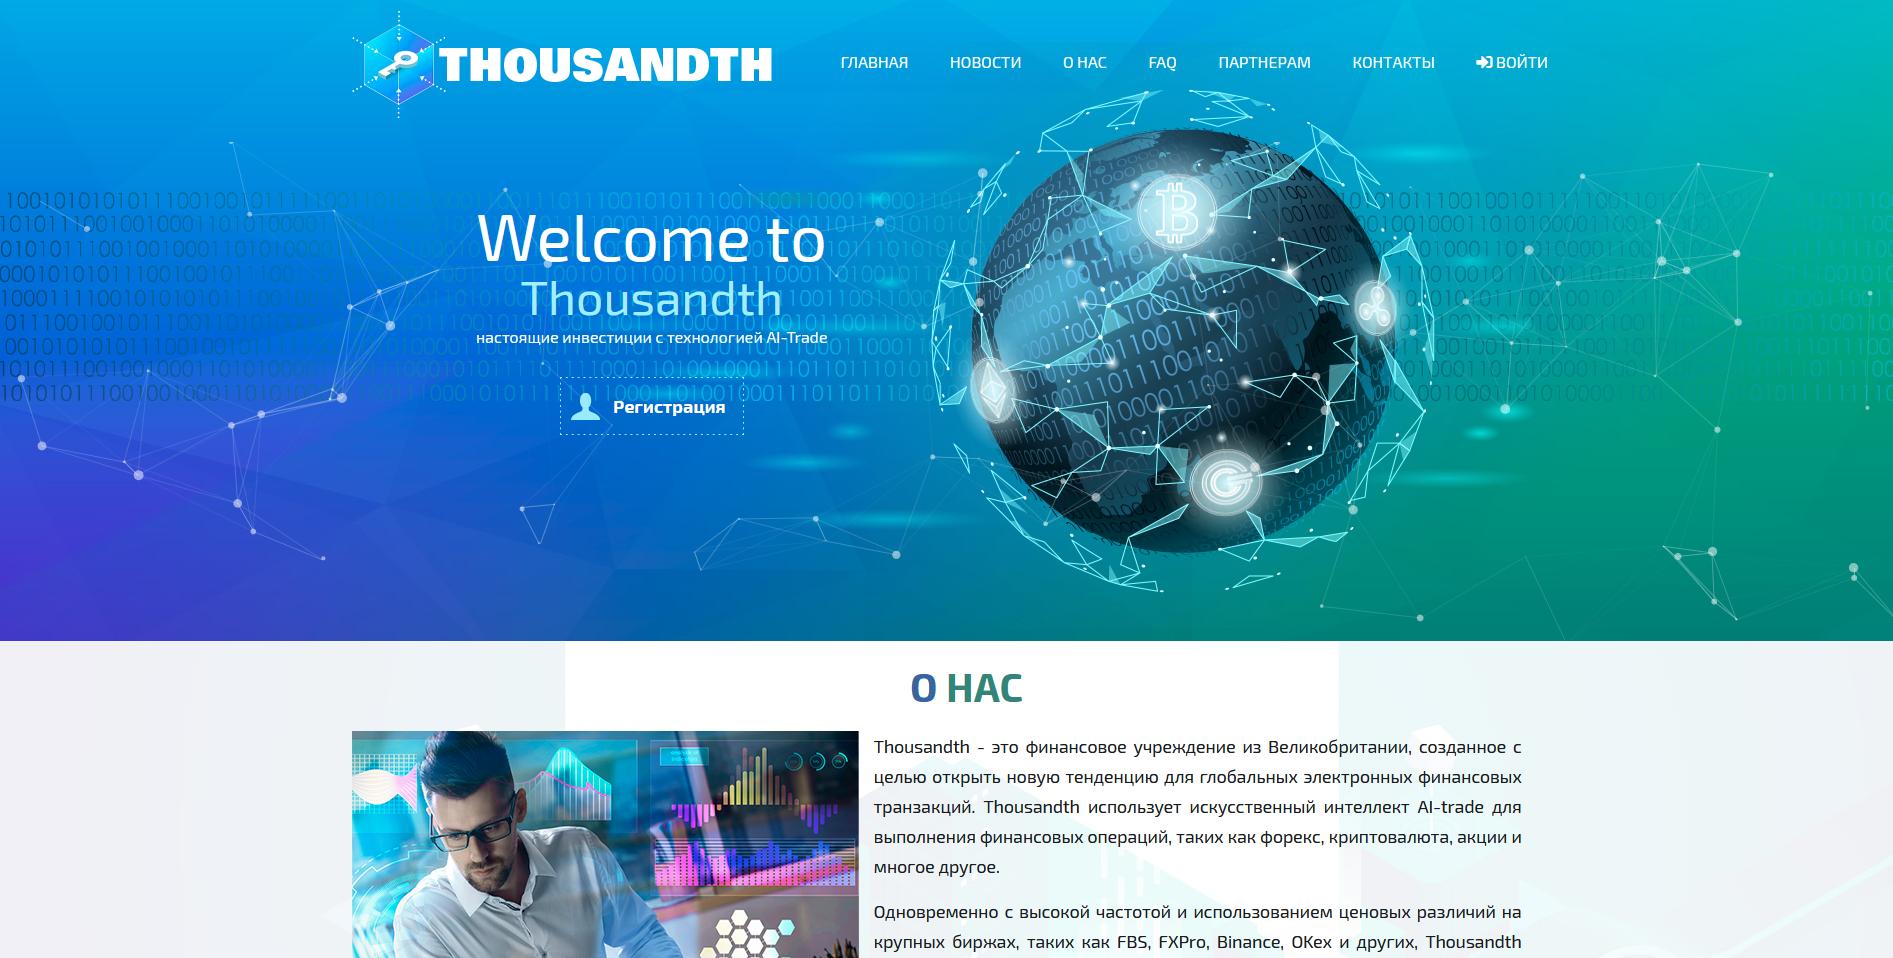 Thousandth - thousandth.org